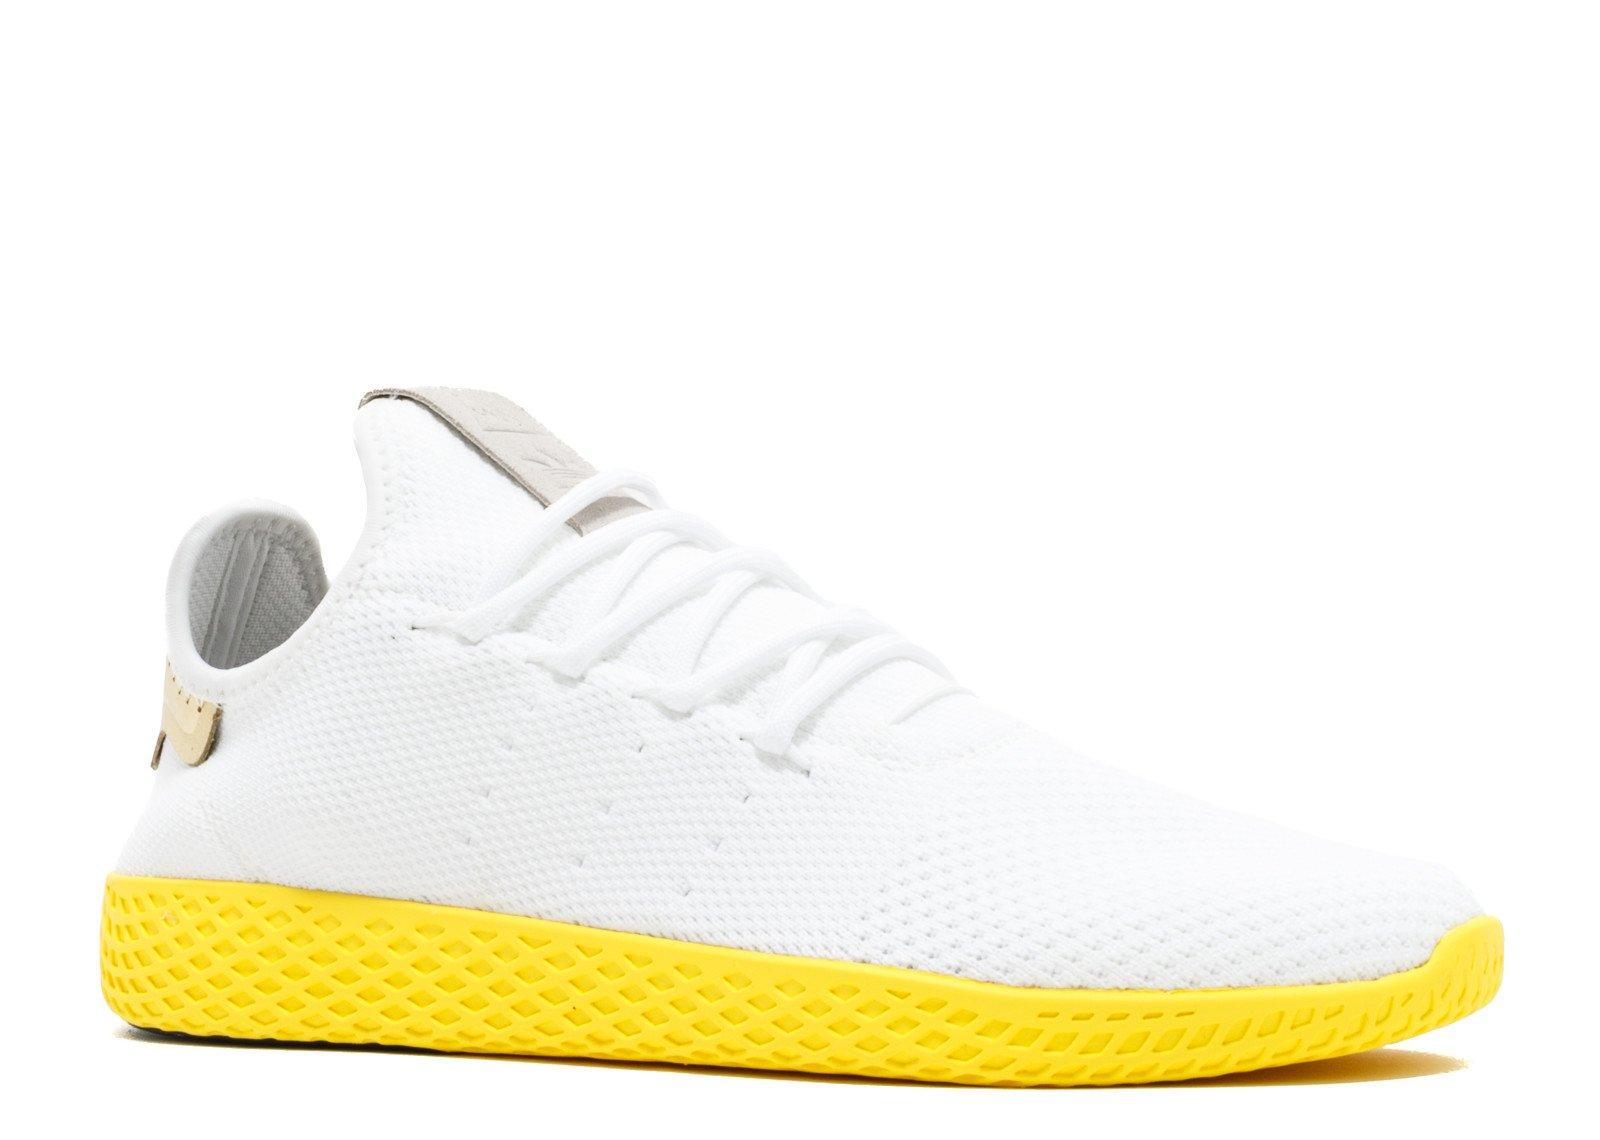 adidas PW Tennins HU Men's Shoes White/Yellow by2674 (4 D(M) US)